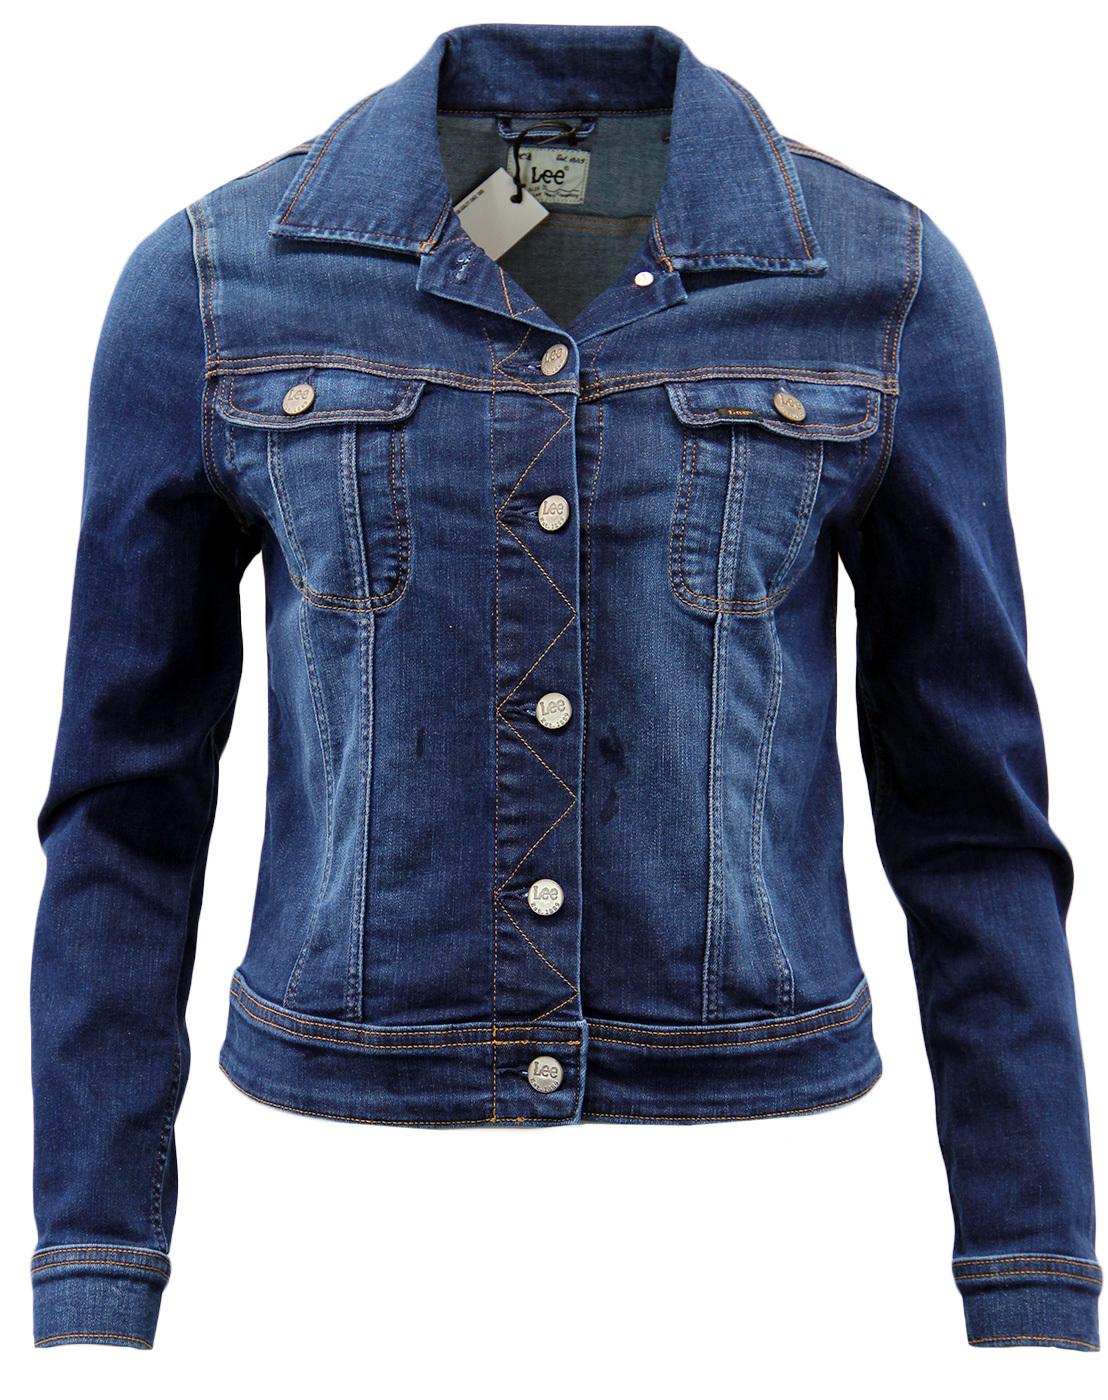 fbff80bc LEE Rider Retro 60s Mod Womens Slim Fit Denim Jacket in Night Sky